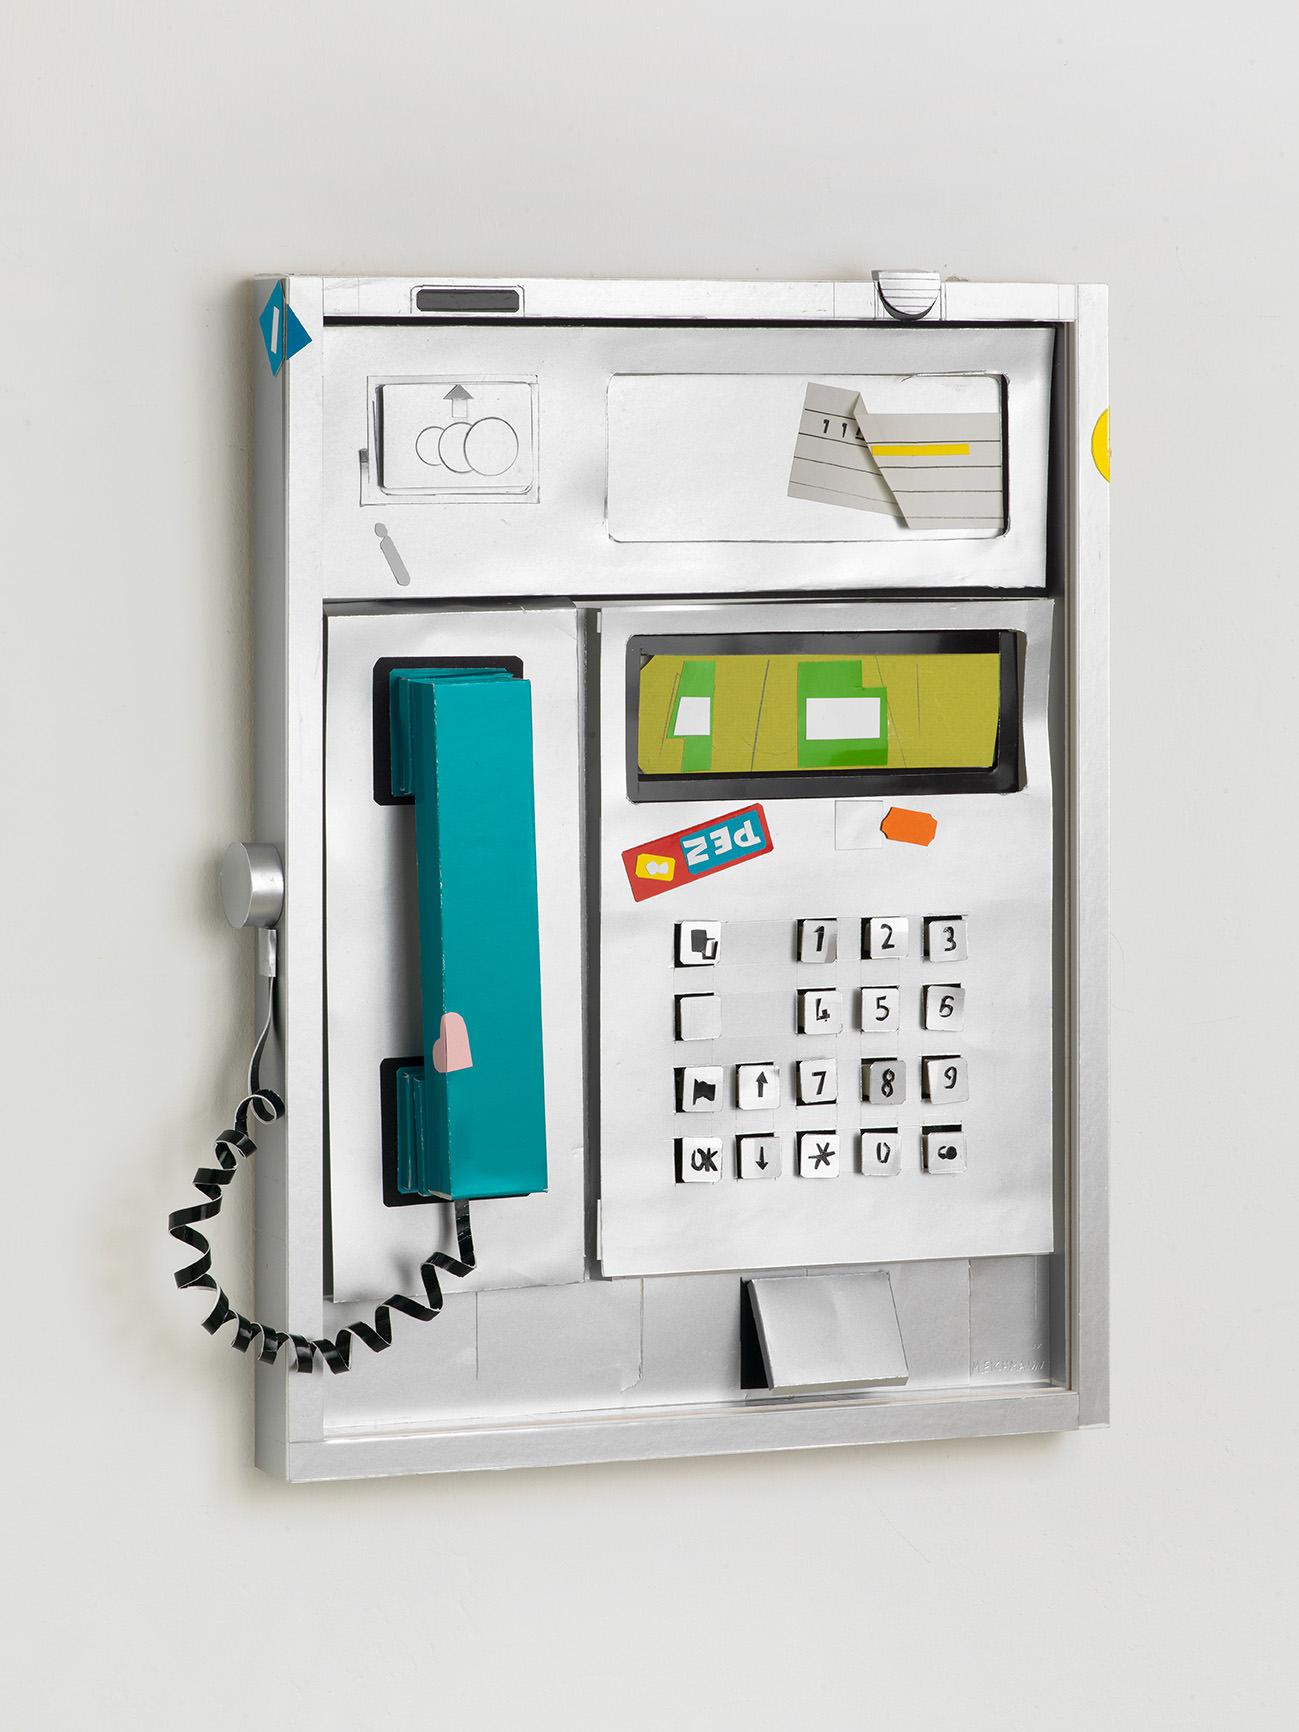 ARION EICHMANN I TELEFON I 42 x 37 x 5 I 2017 I PAPIER